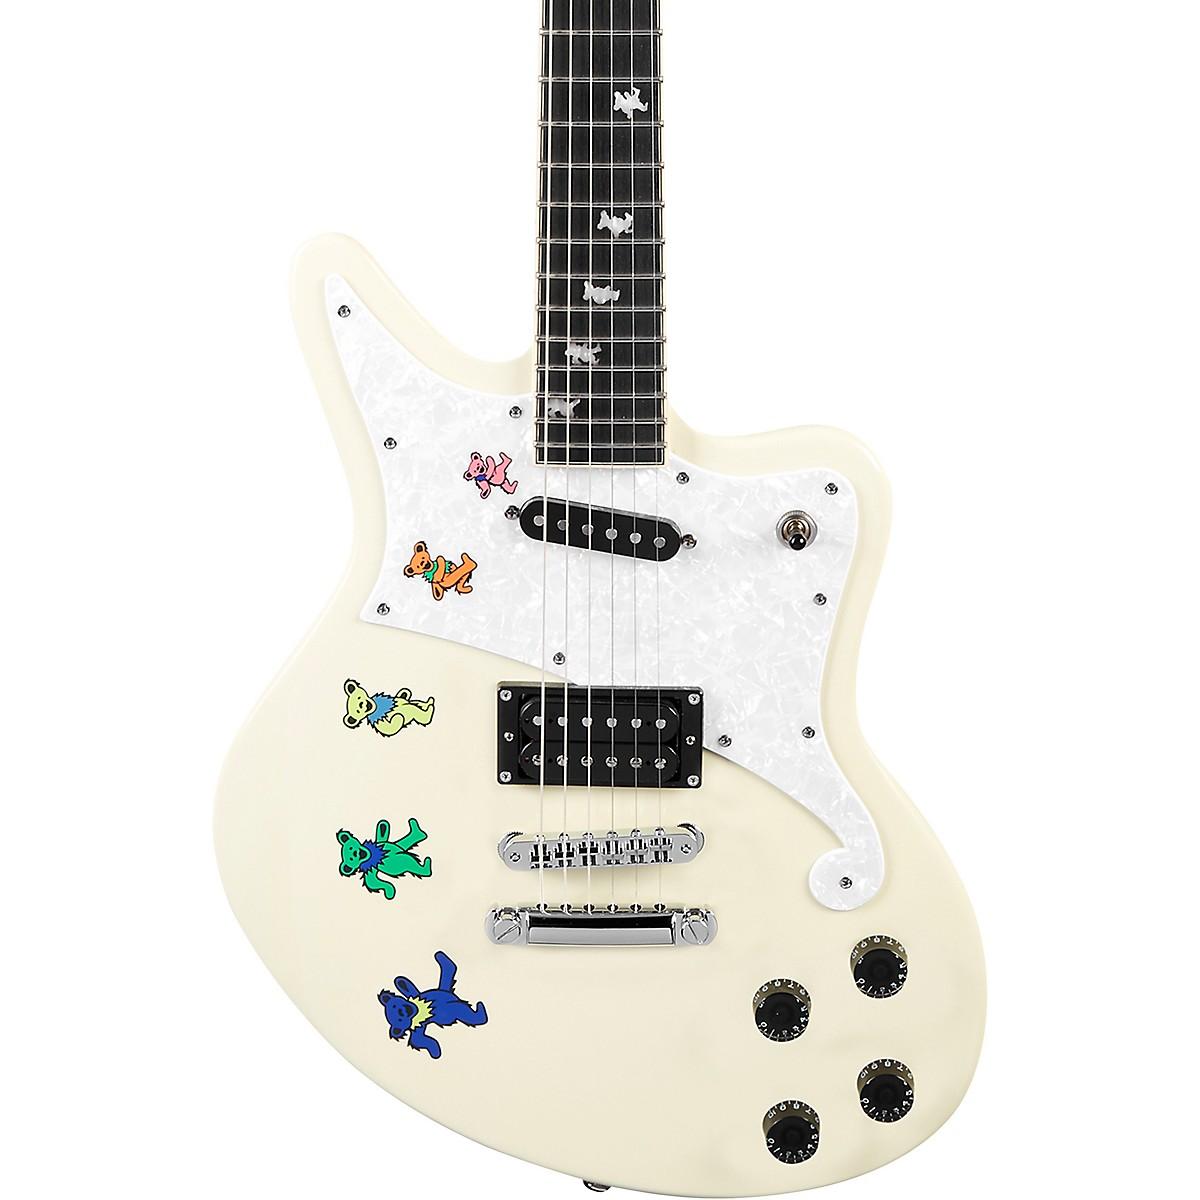 D'Angelico Premier Series Bedford Grateful Dead Special Edition Electric Guitar